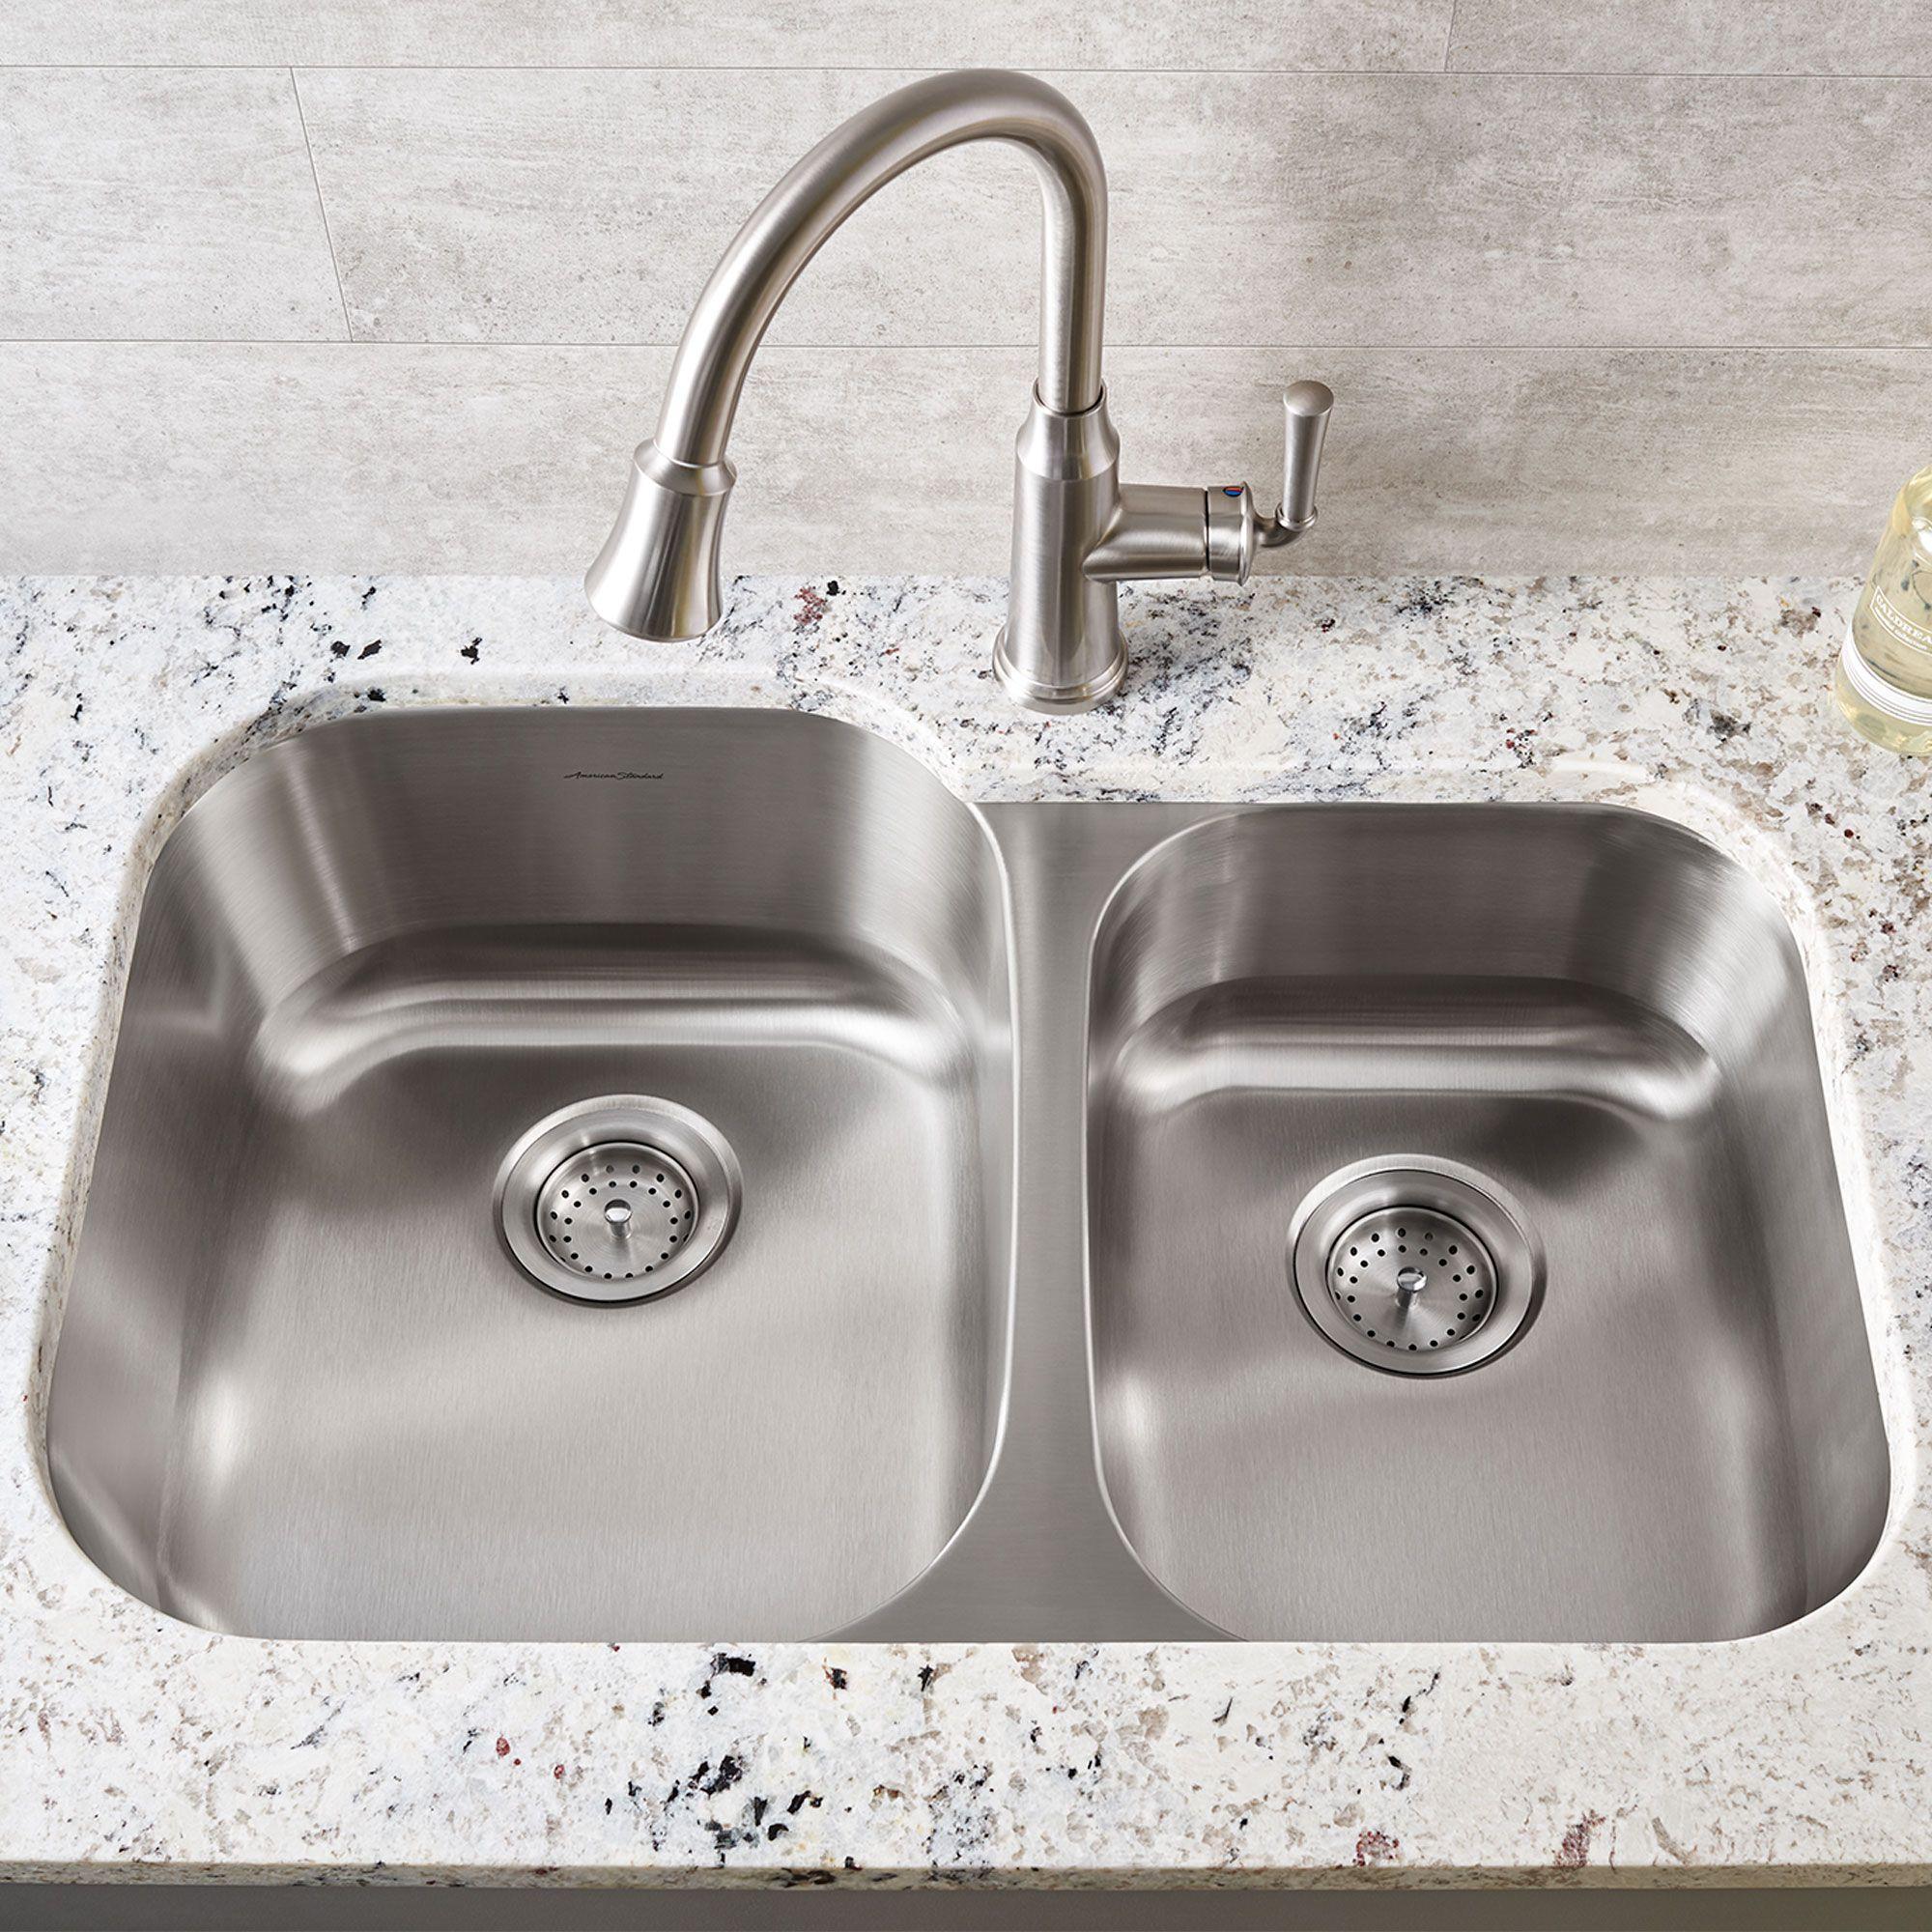 American Standard Portsmouth Stainless Steel Sink Kitchen Sink Beach Cottage Style Double Bowl Kitchen Sink